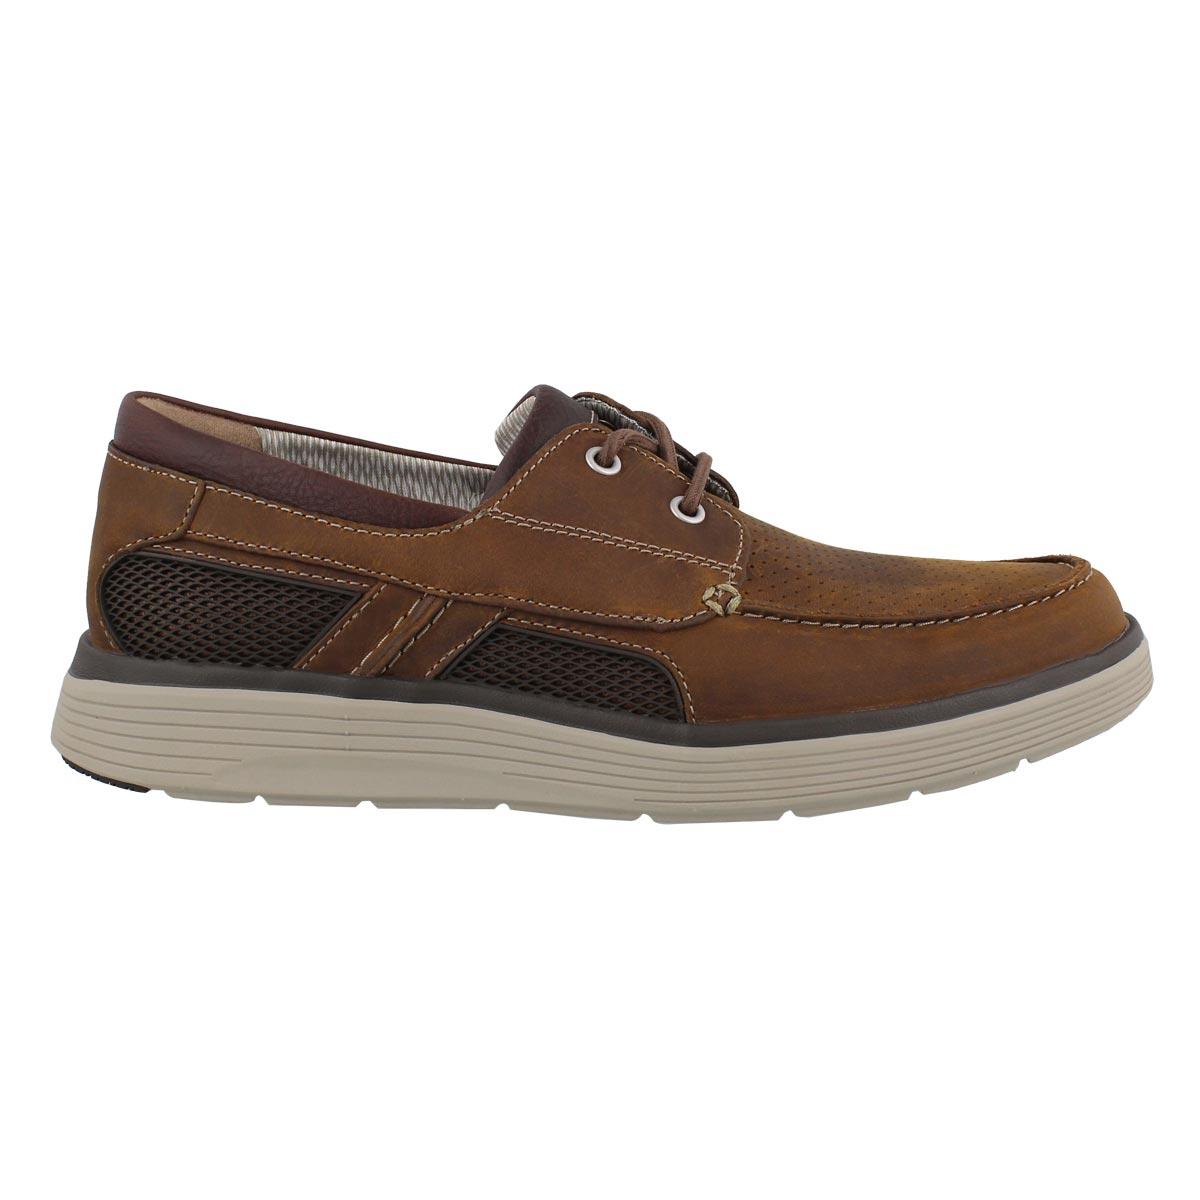 Mns UnAbode Step dk tan boat shoe